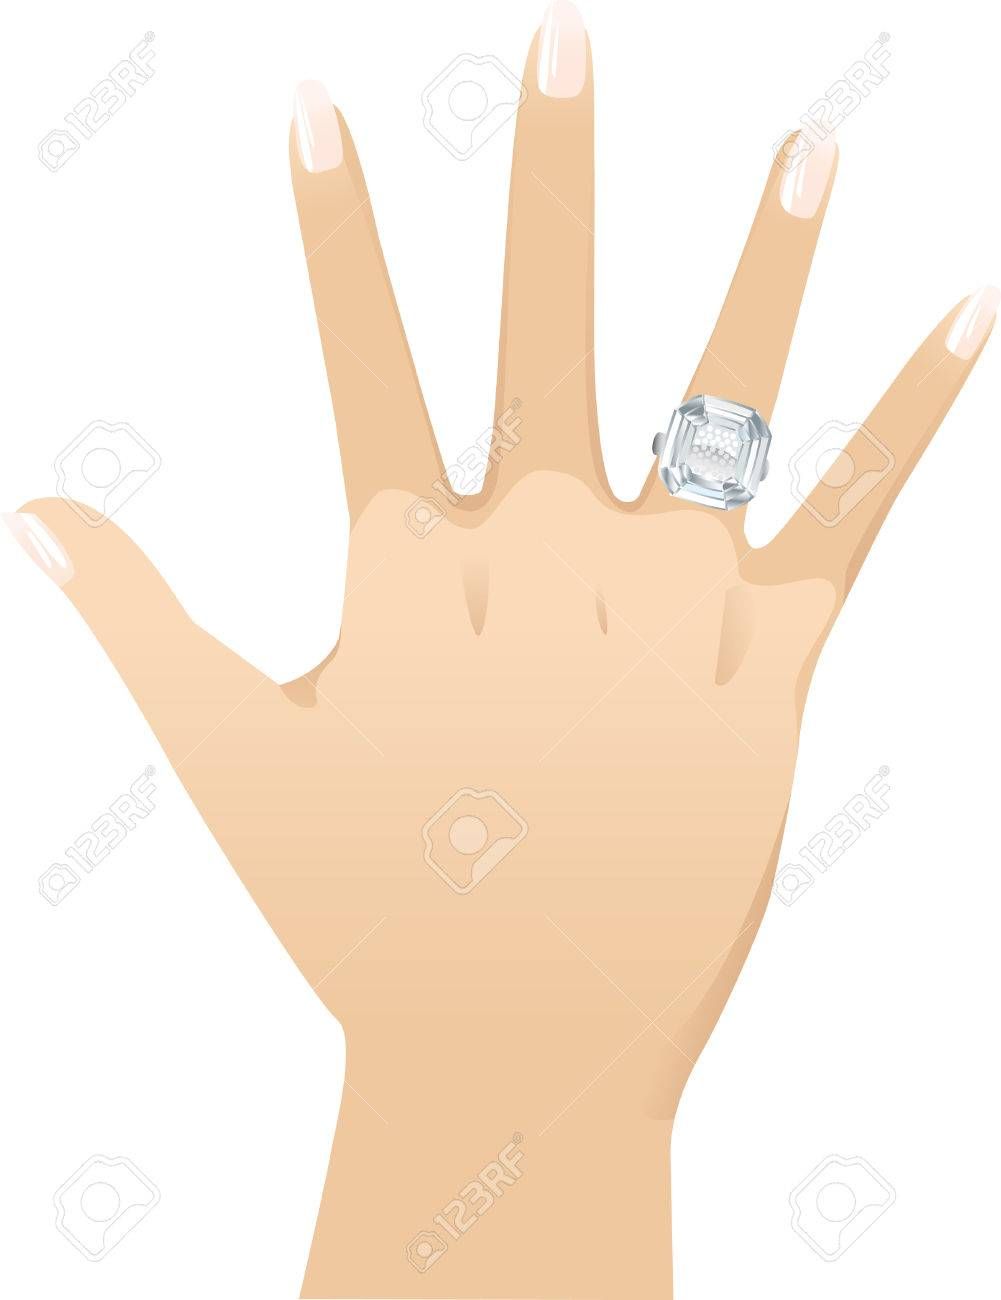 Asscher cut diamond - for left hand just flip the image. Stock Vector - 7885182